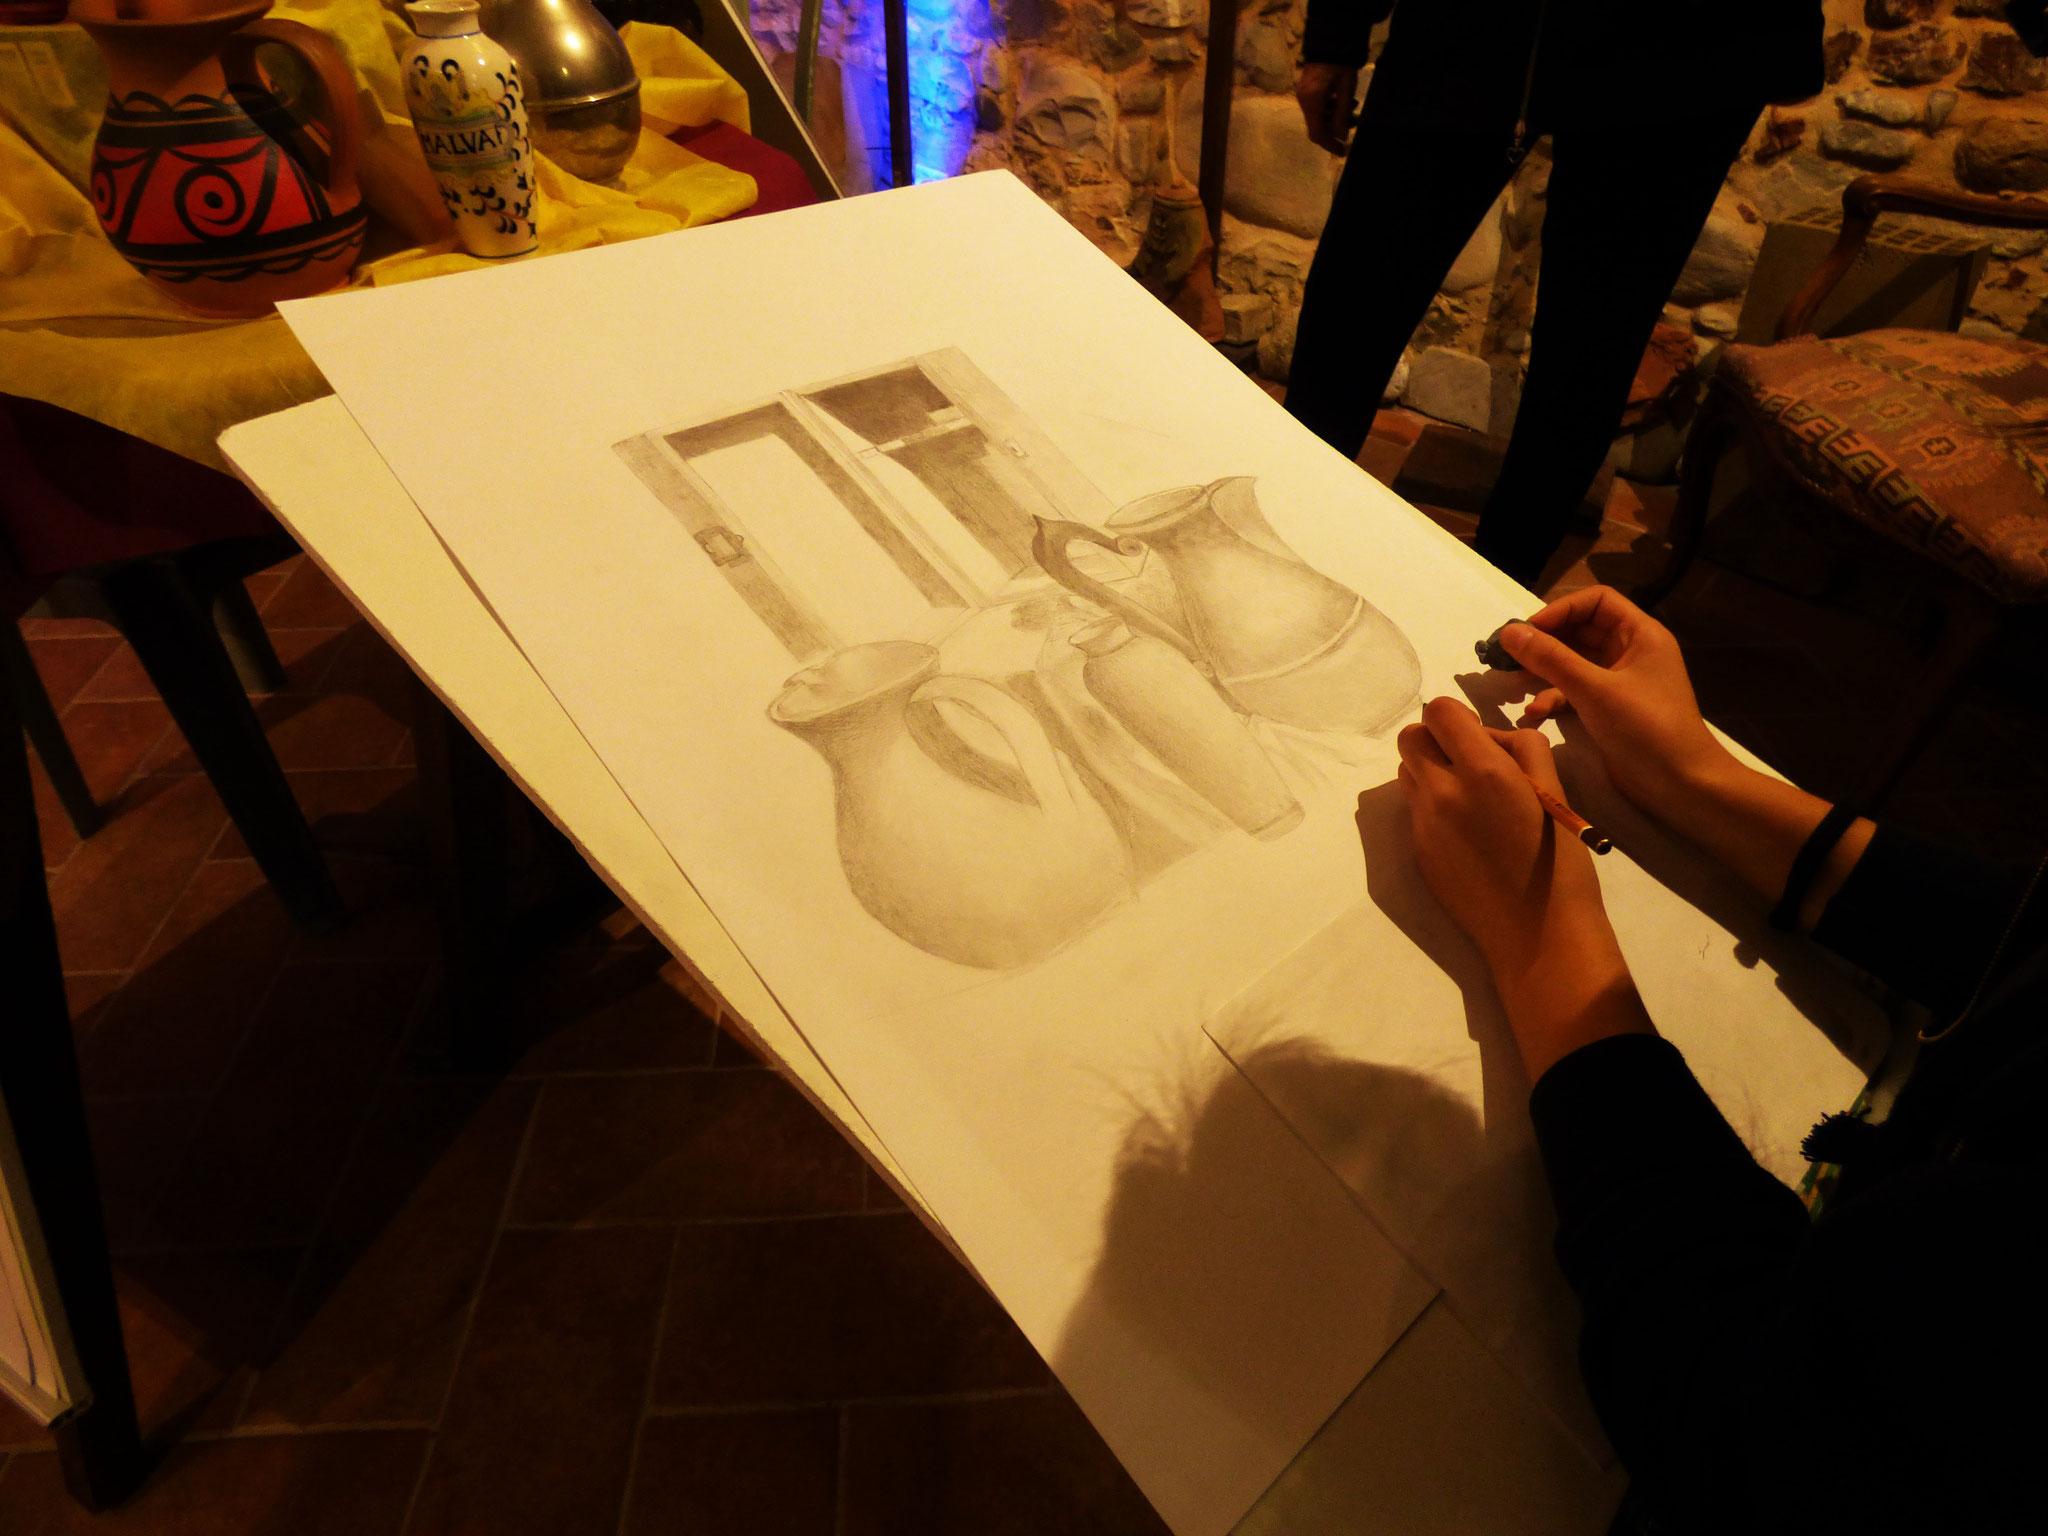 """ARTE IN BOTTEGA""     NEL NUOVO SPAZIO ARTISTICO DI RIVERGARO  VIA SOPRA RIVO 22 DIARA - Rivergaro (PC)"